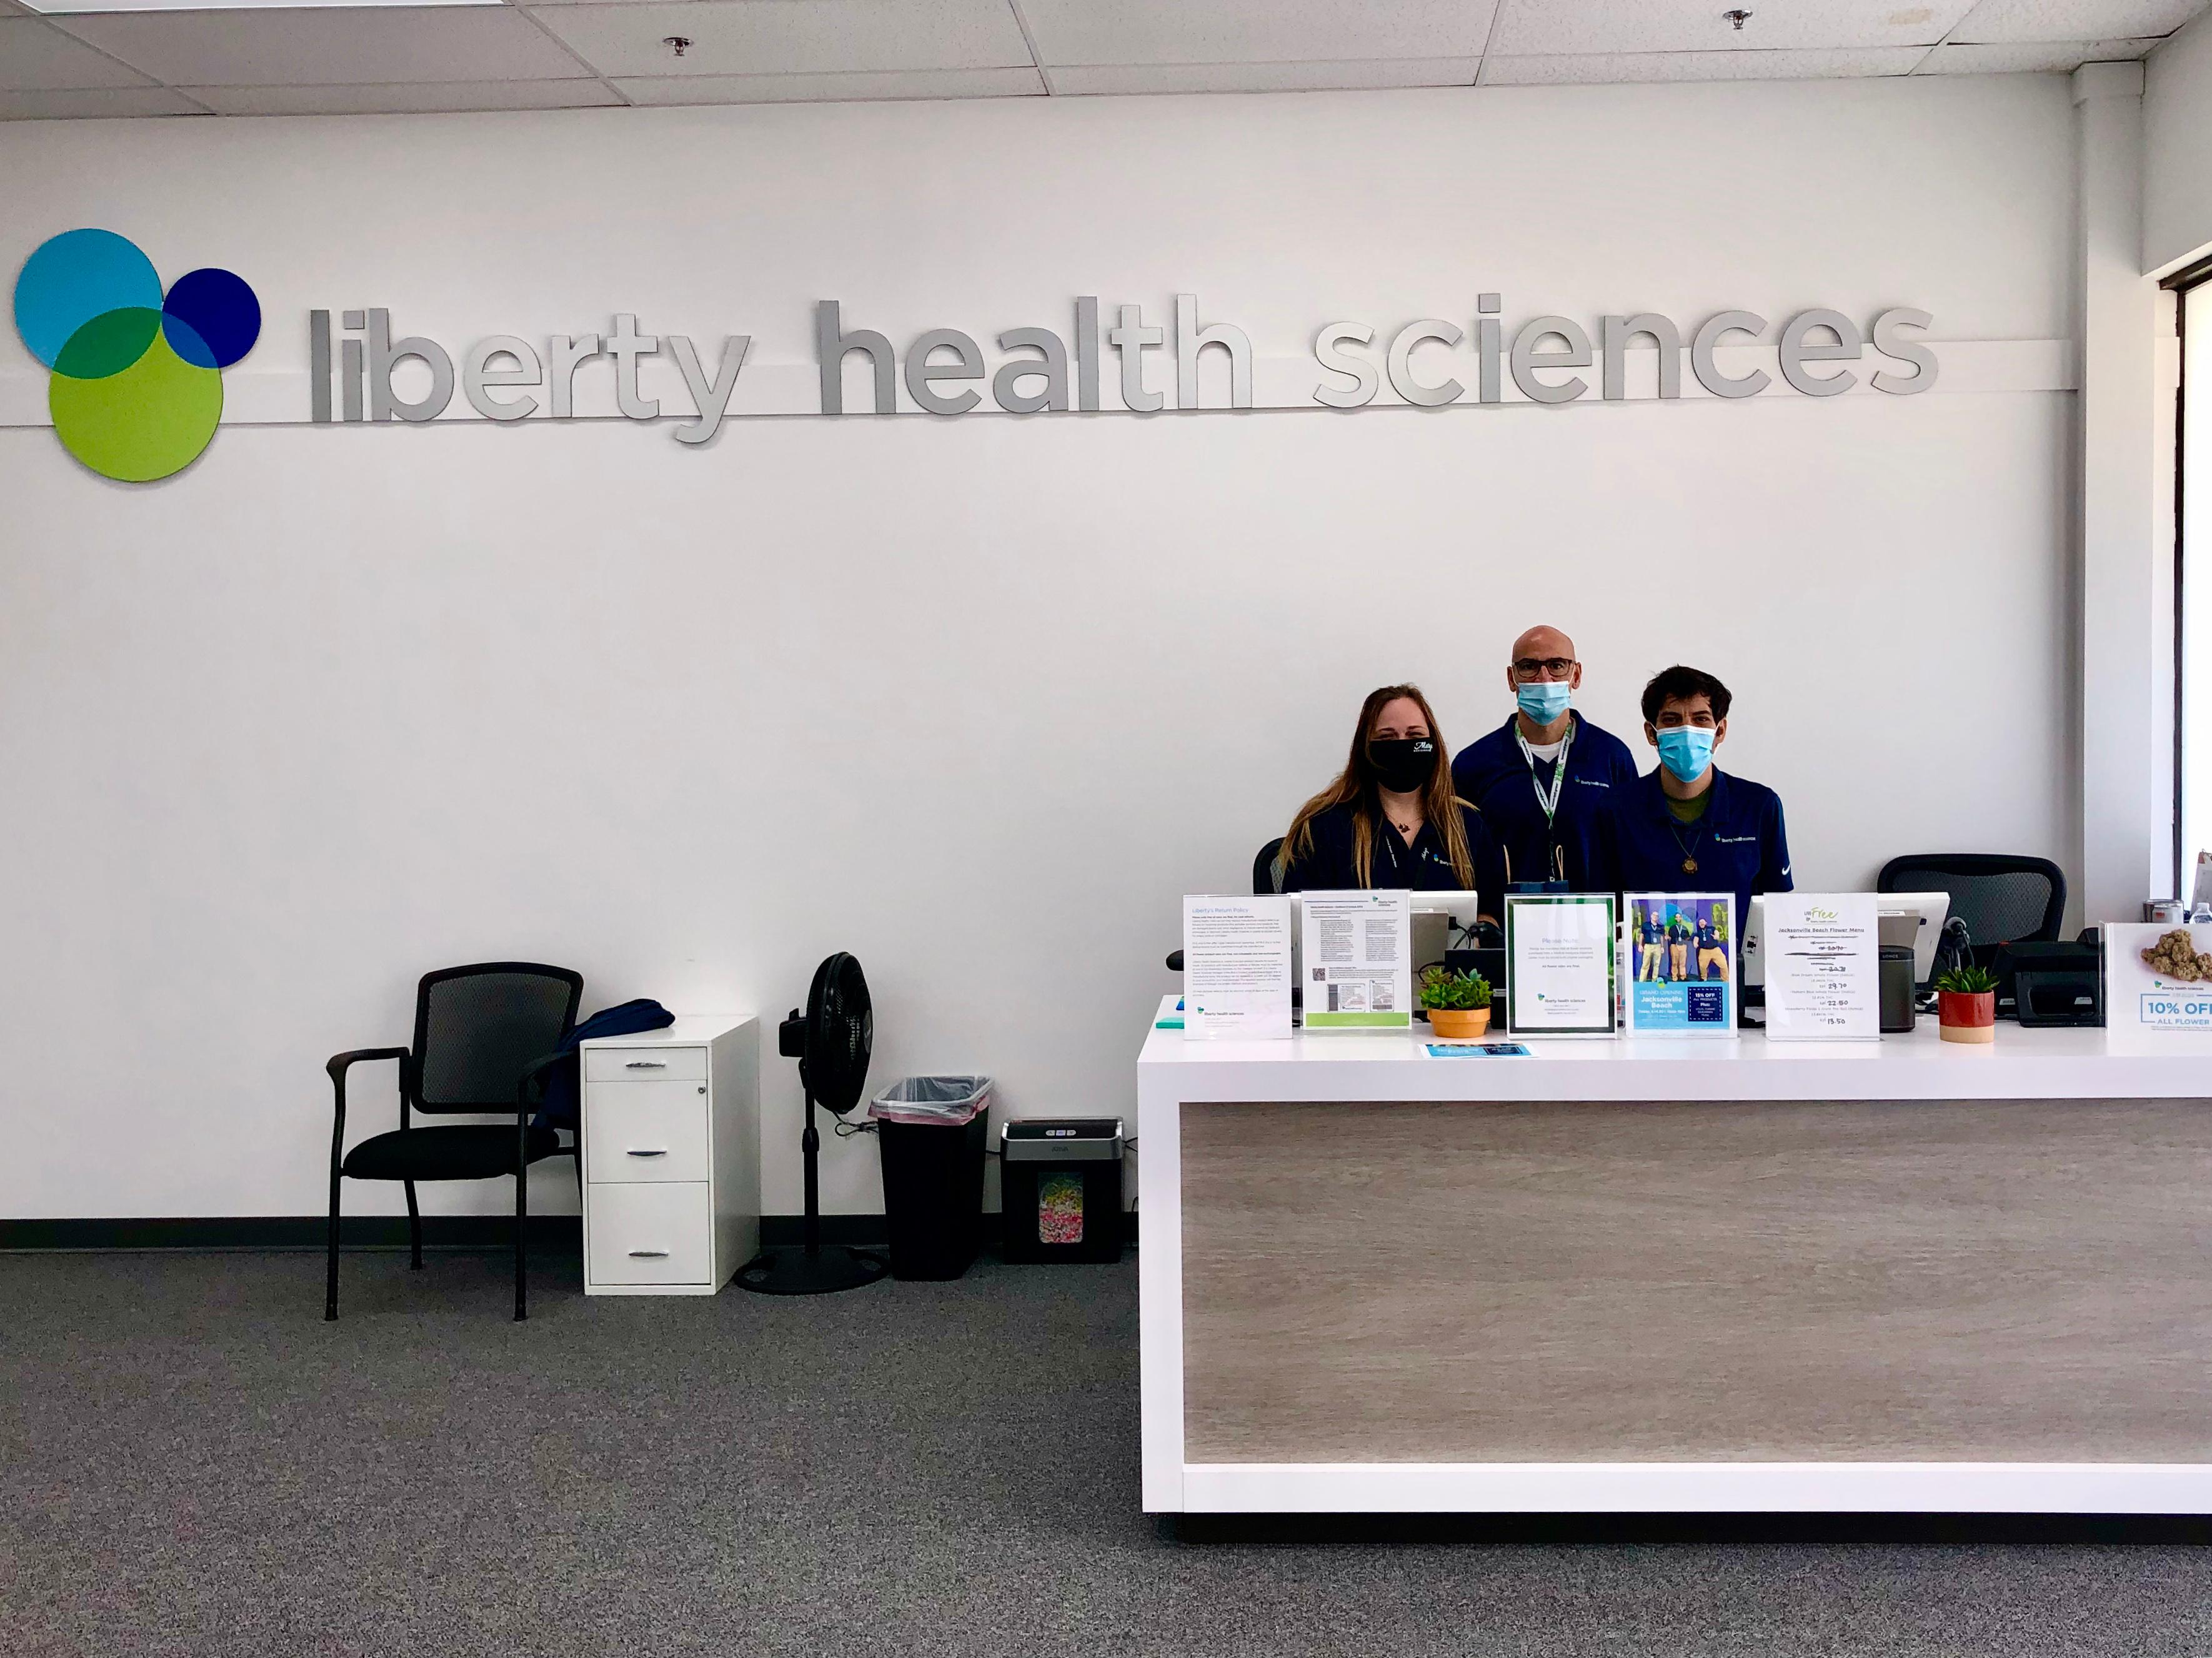 Liberty Health Sciences Medical Marijuana Dispensary Jacksonville Beach